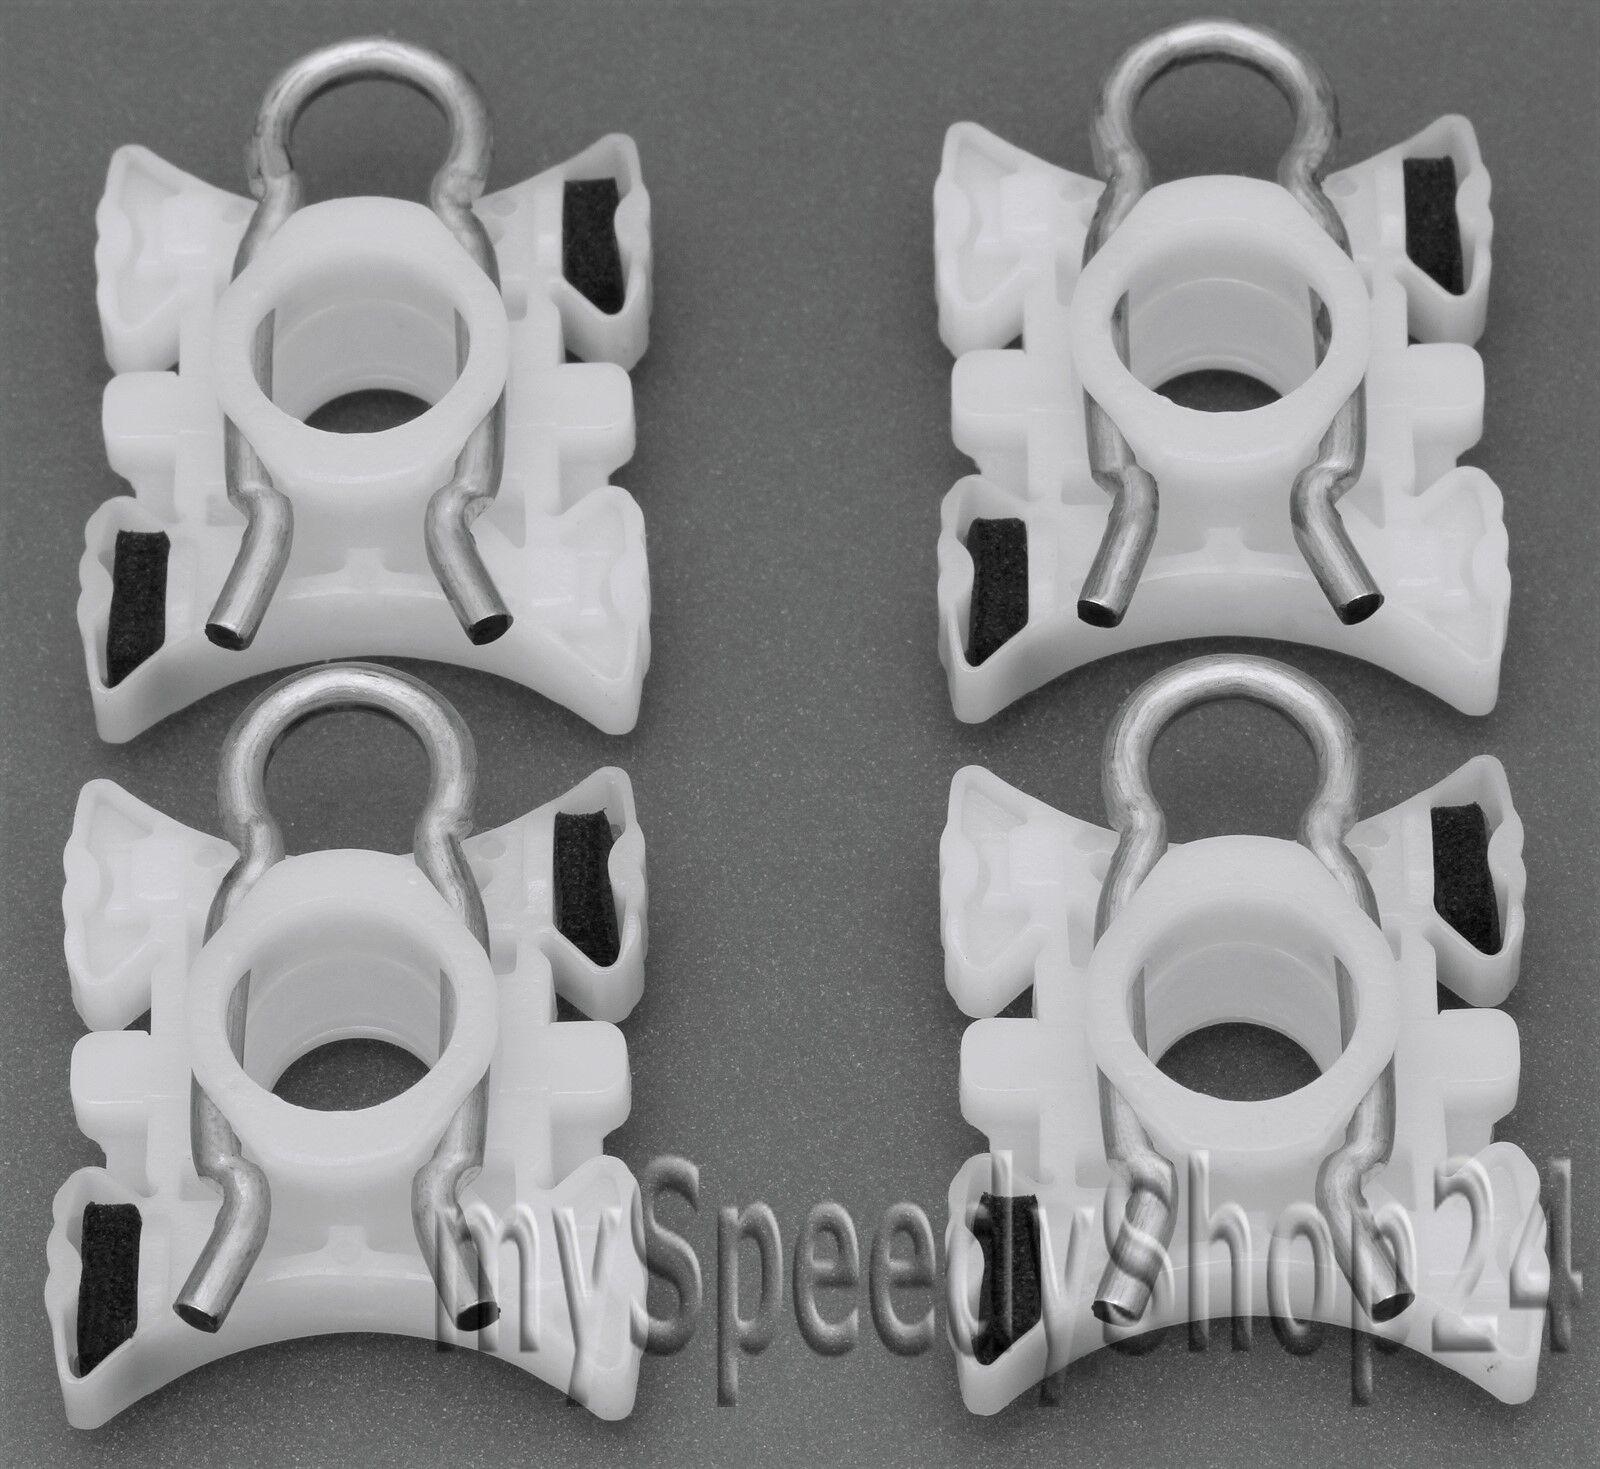 2 x Fensterheber Gleitstück Reparatursatz für BMW 5er E34 7er E32-51321938884